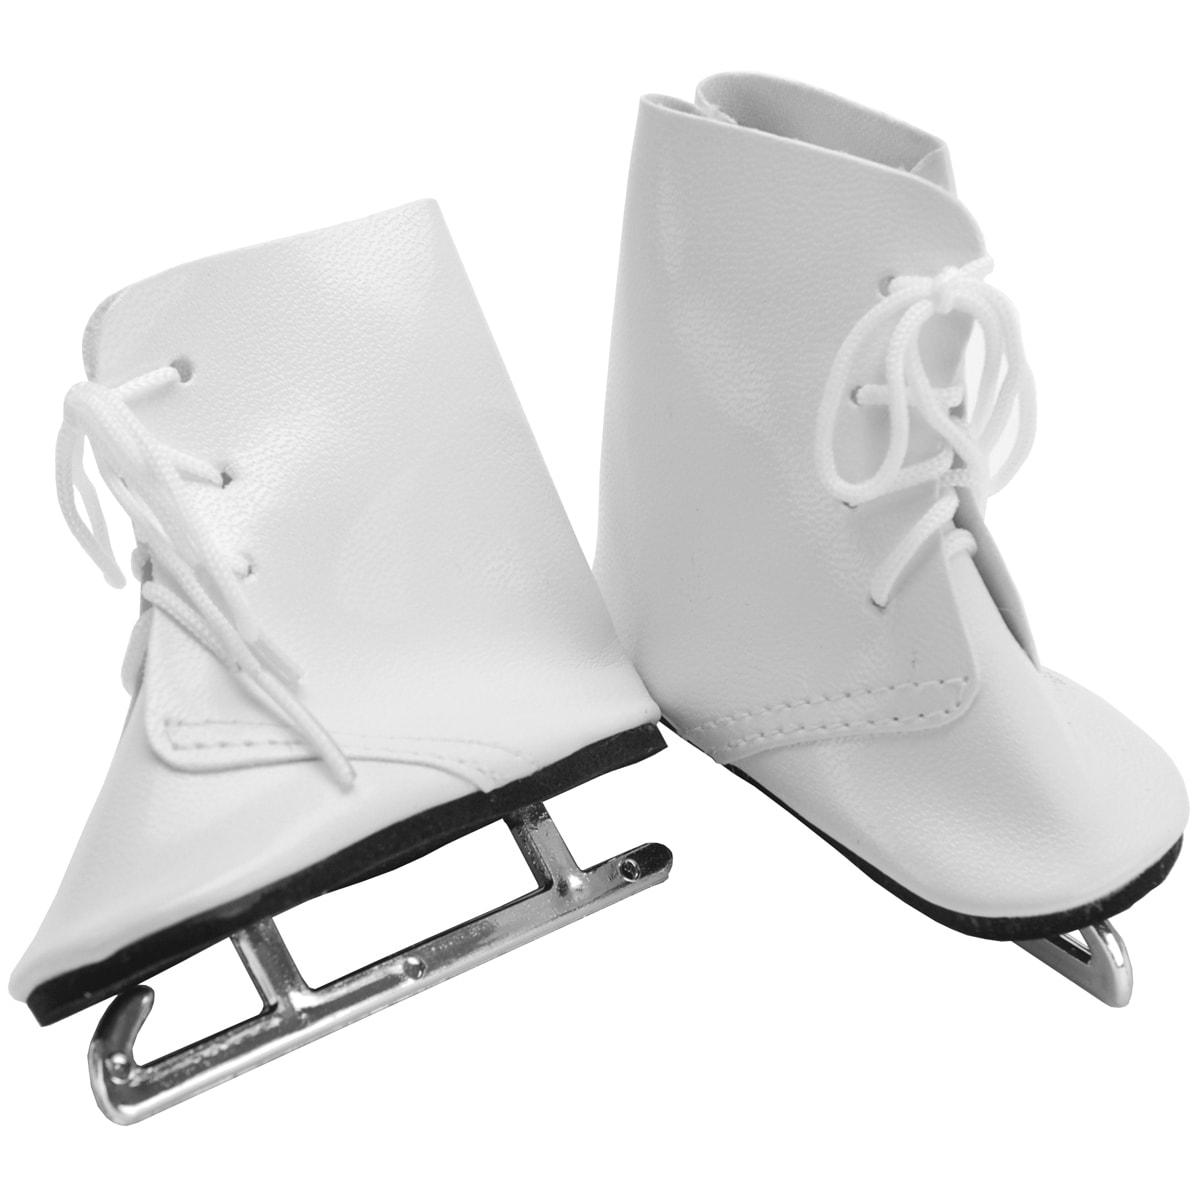 Fibre-Craft Springfield Collection Ice Skates-White